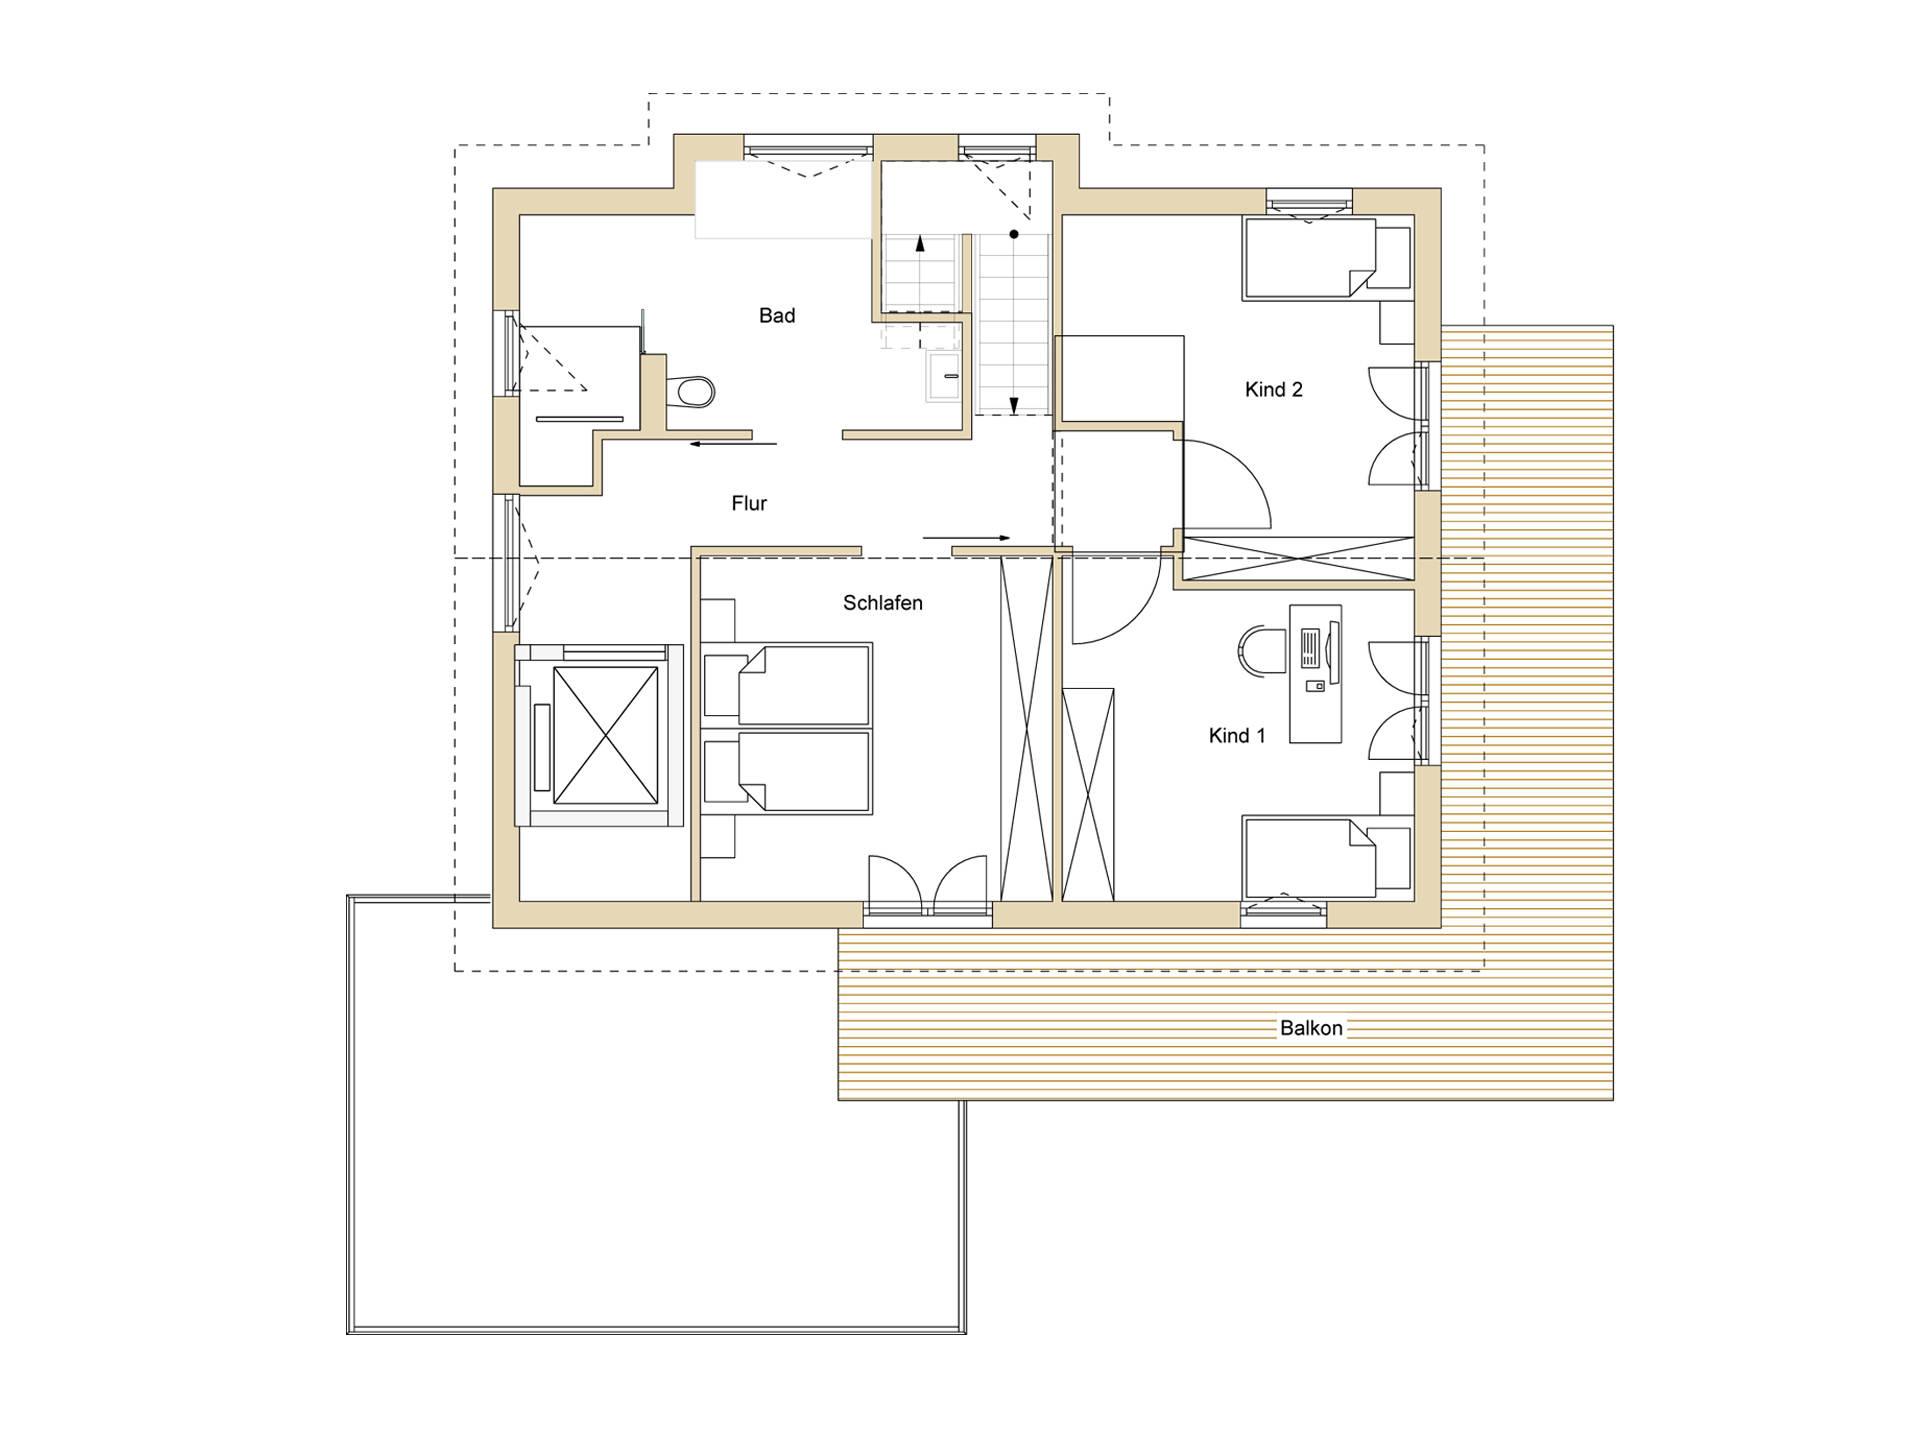 Haus design 170 frammelsberger r ingenieur holzhaus for Muster grundrisse haus